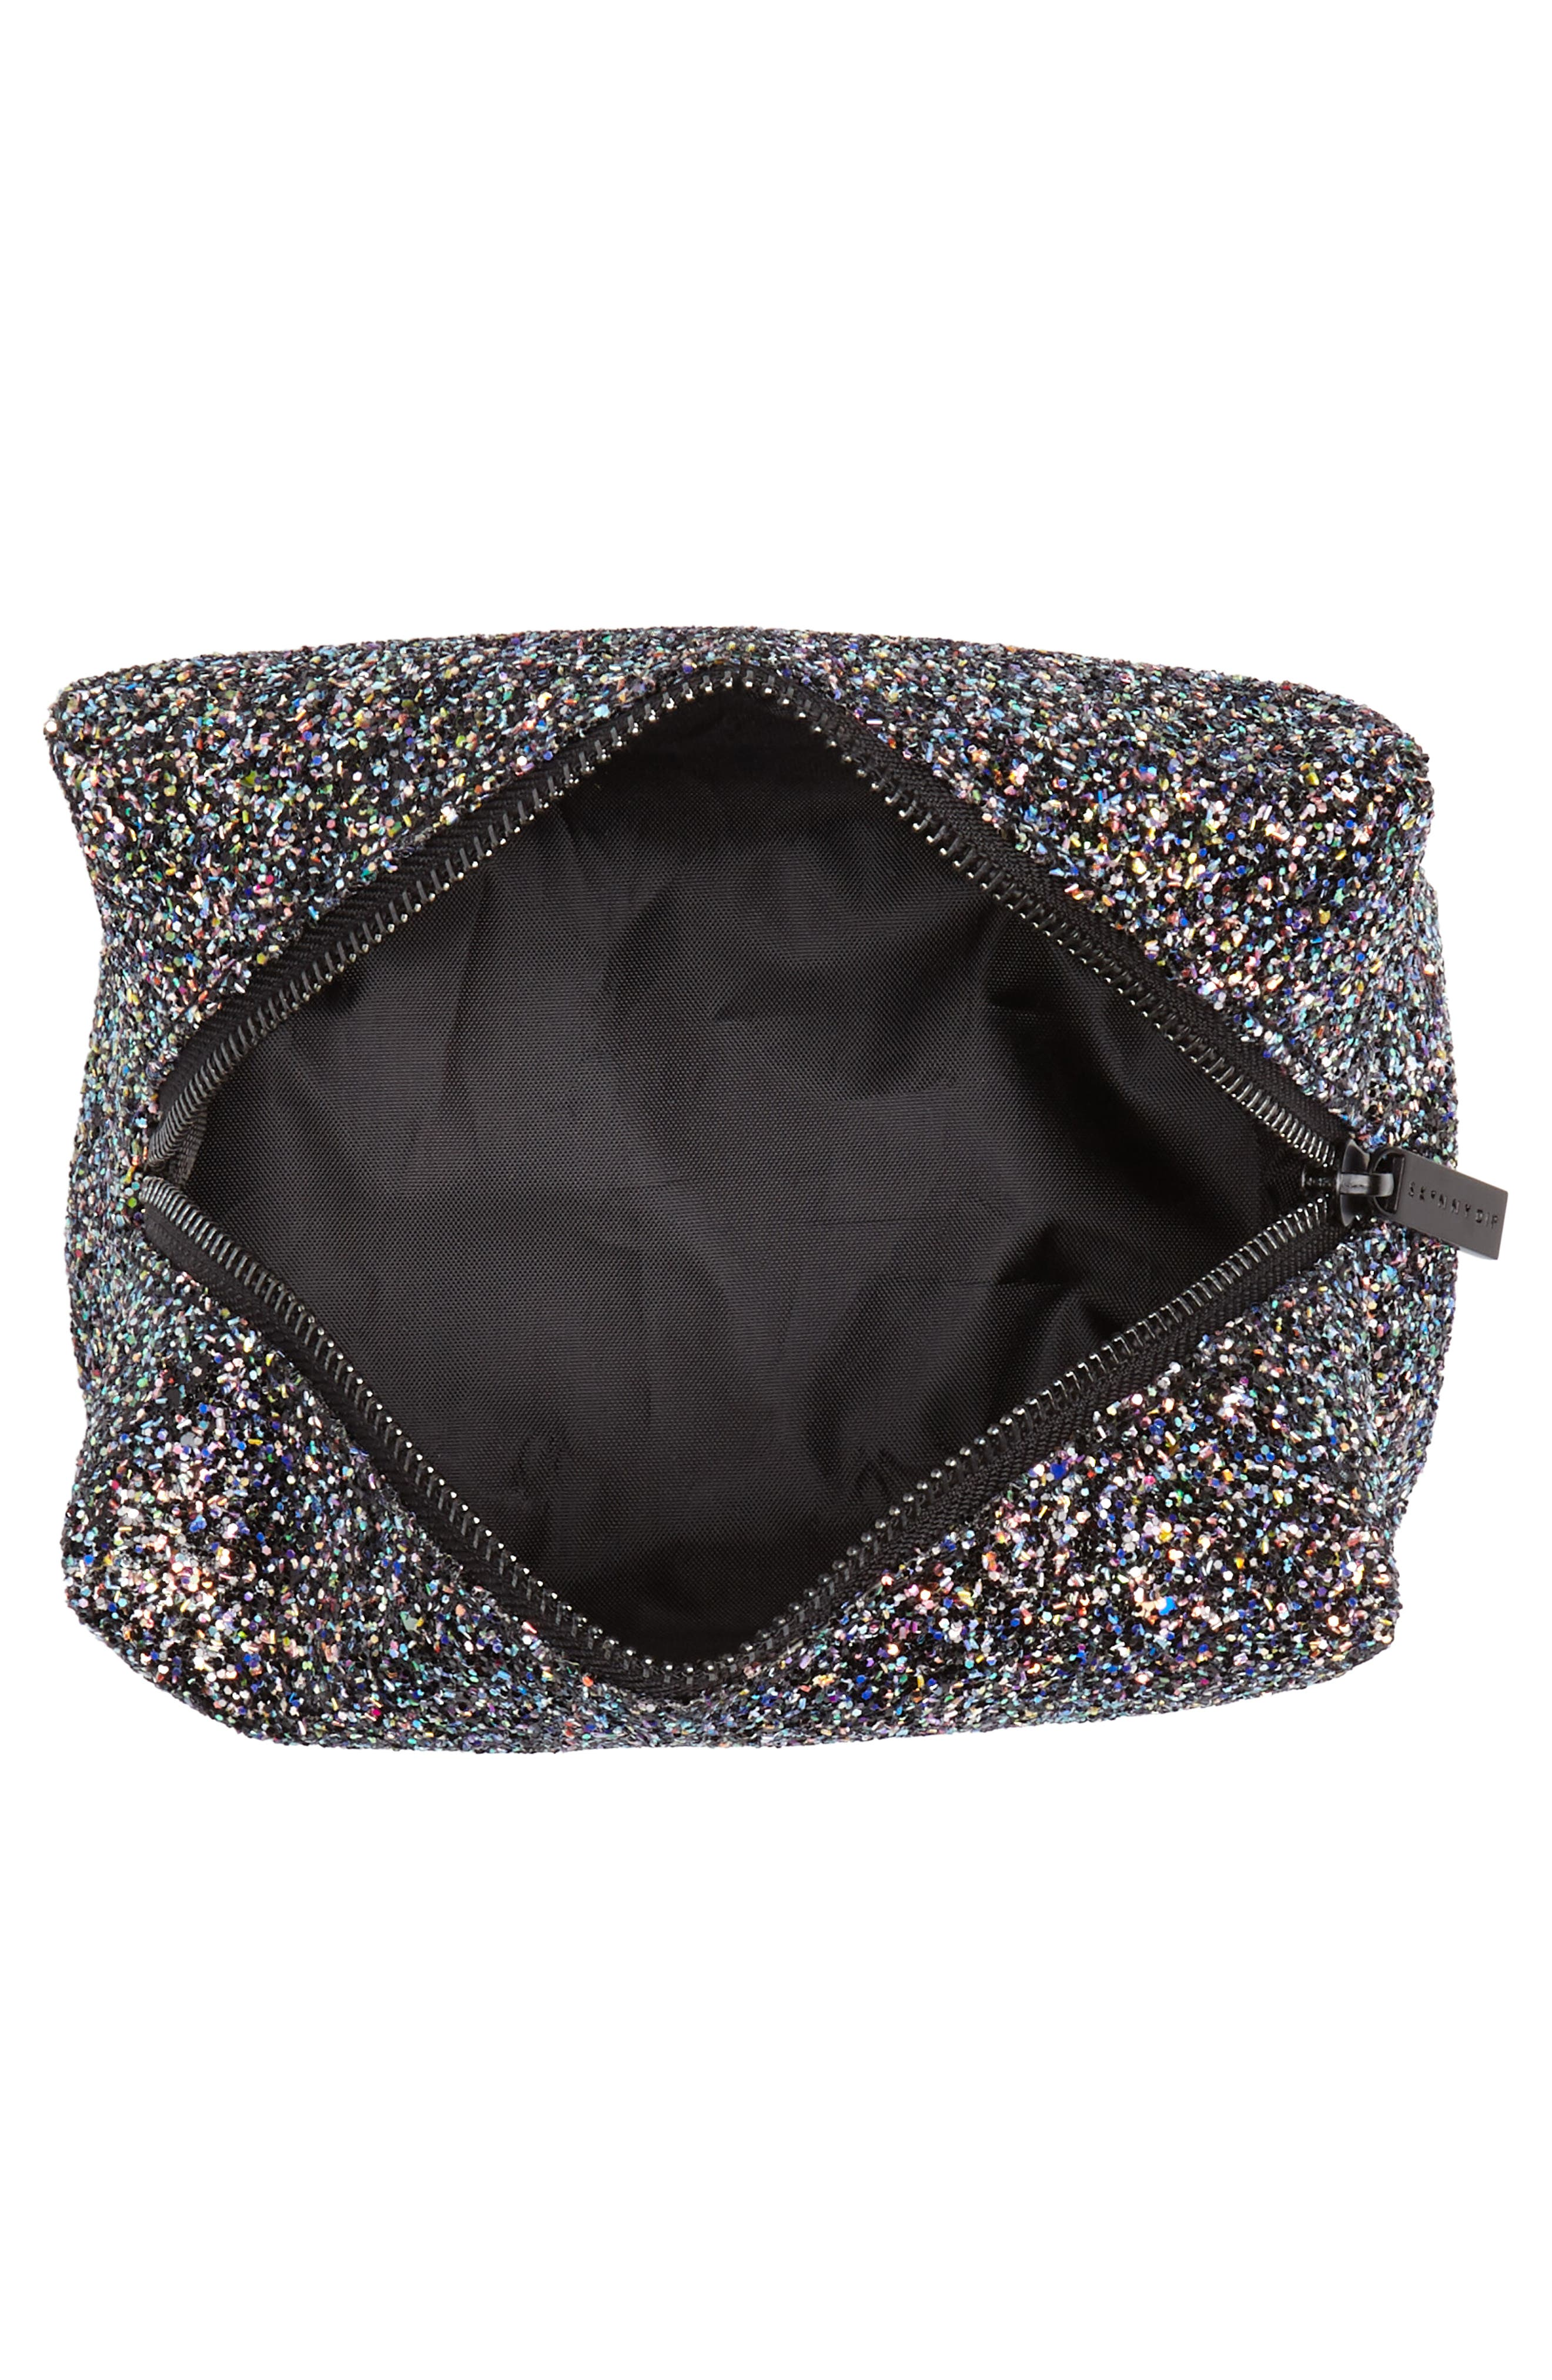 Skinny Dip Liquorice Glitter Cosmetics Bag,                             Alternate thumbnail 3, color,                             No Color